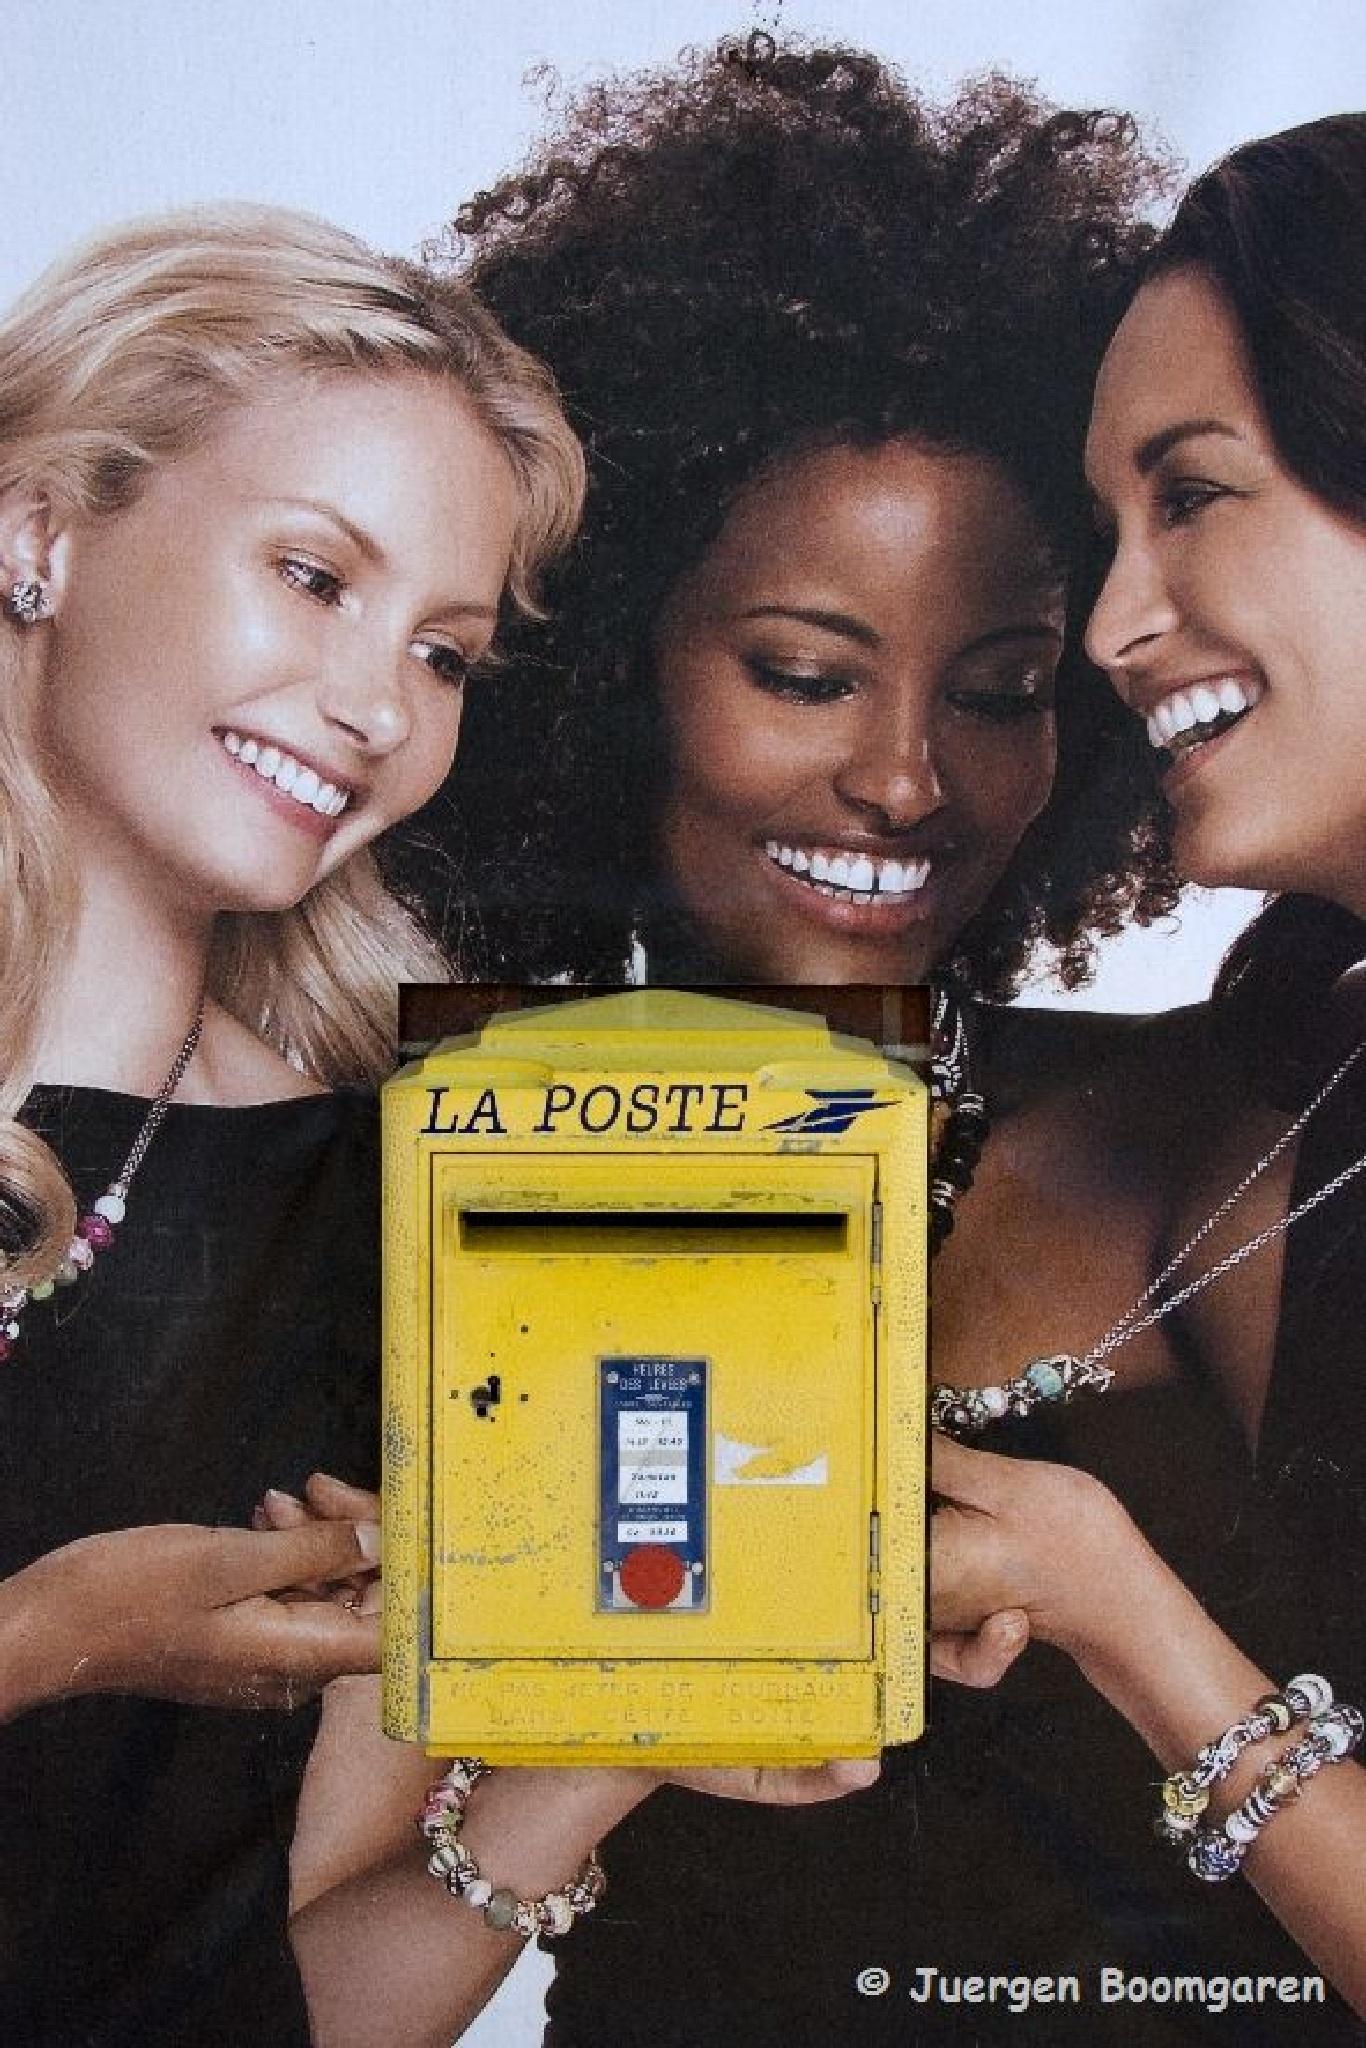 Postbox by Juergen Boomgaren